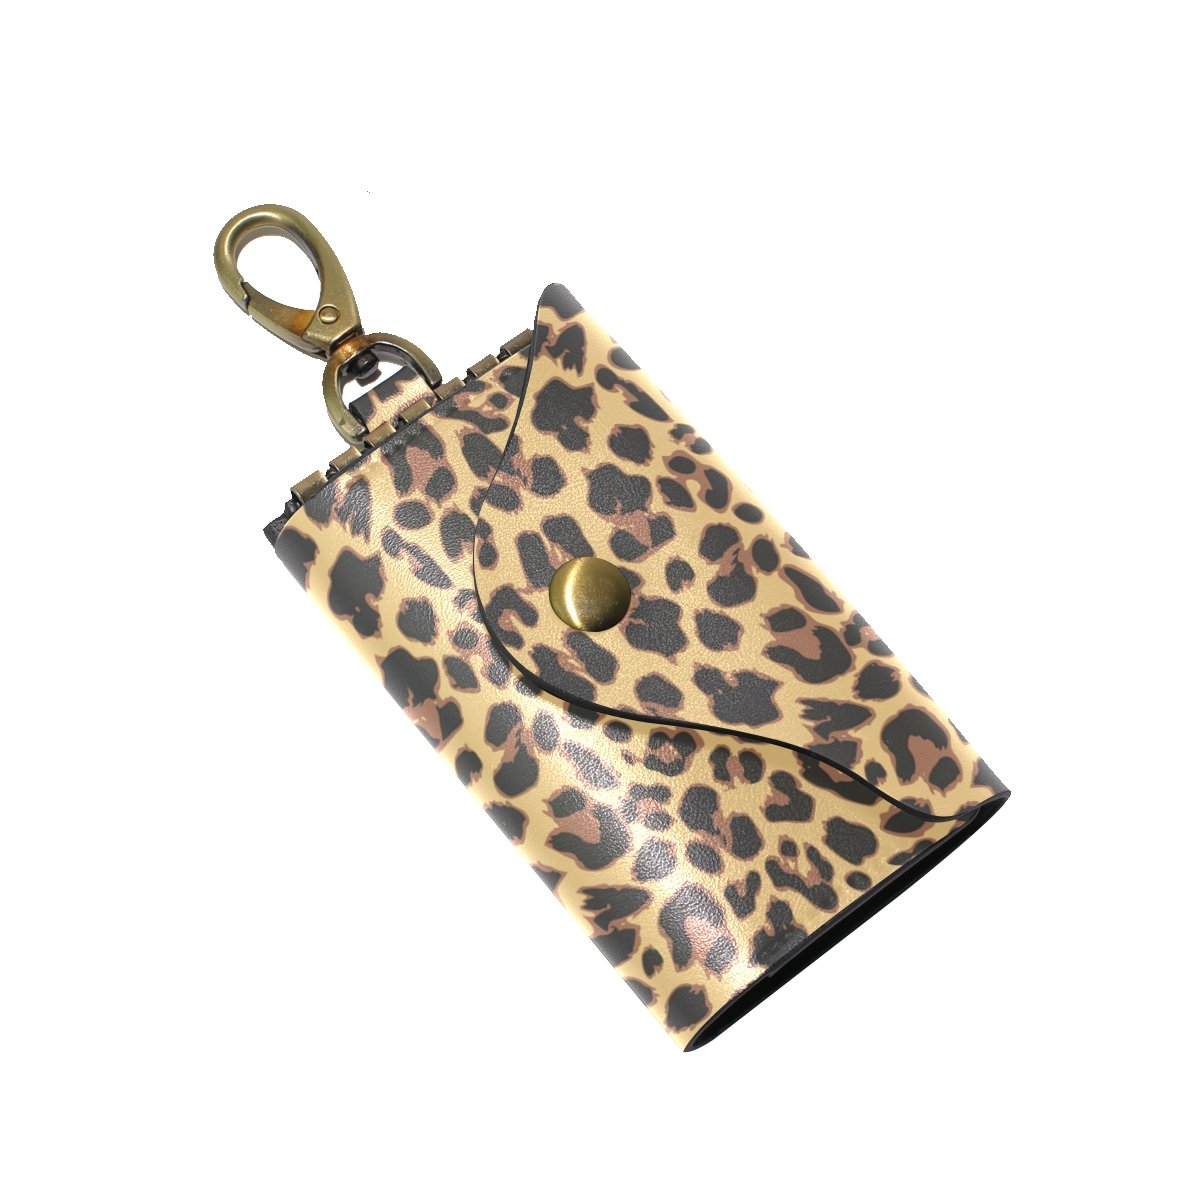 KEAKIA Leopard Pattern Design Leather Key Case Wallets Tri-fold Key Holder Keychains with 6 Hooks 2 Slot Snap Closure for Men Women